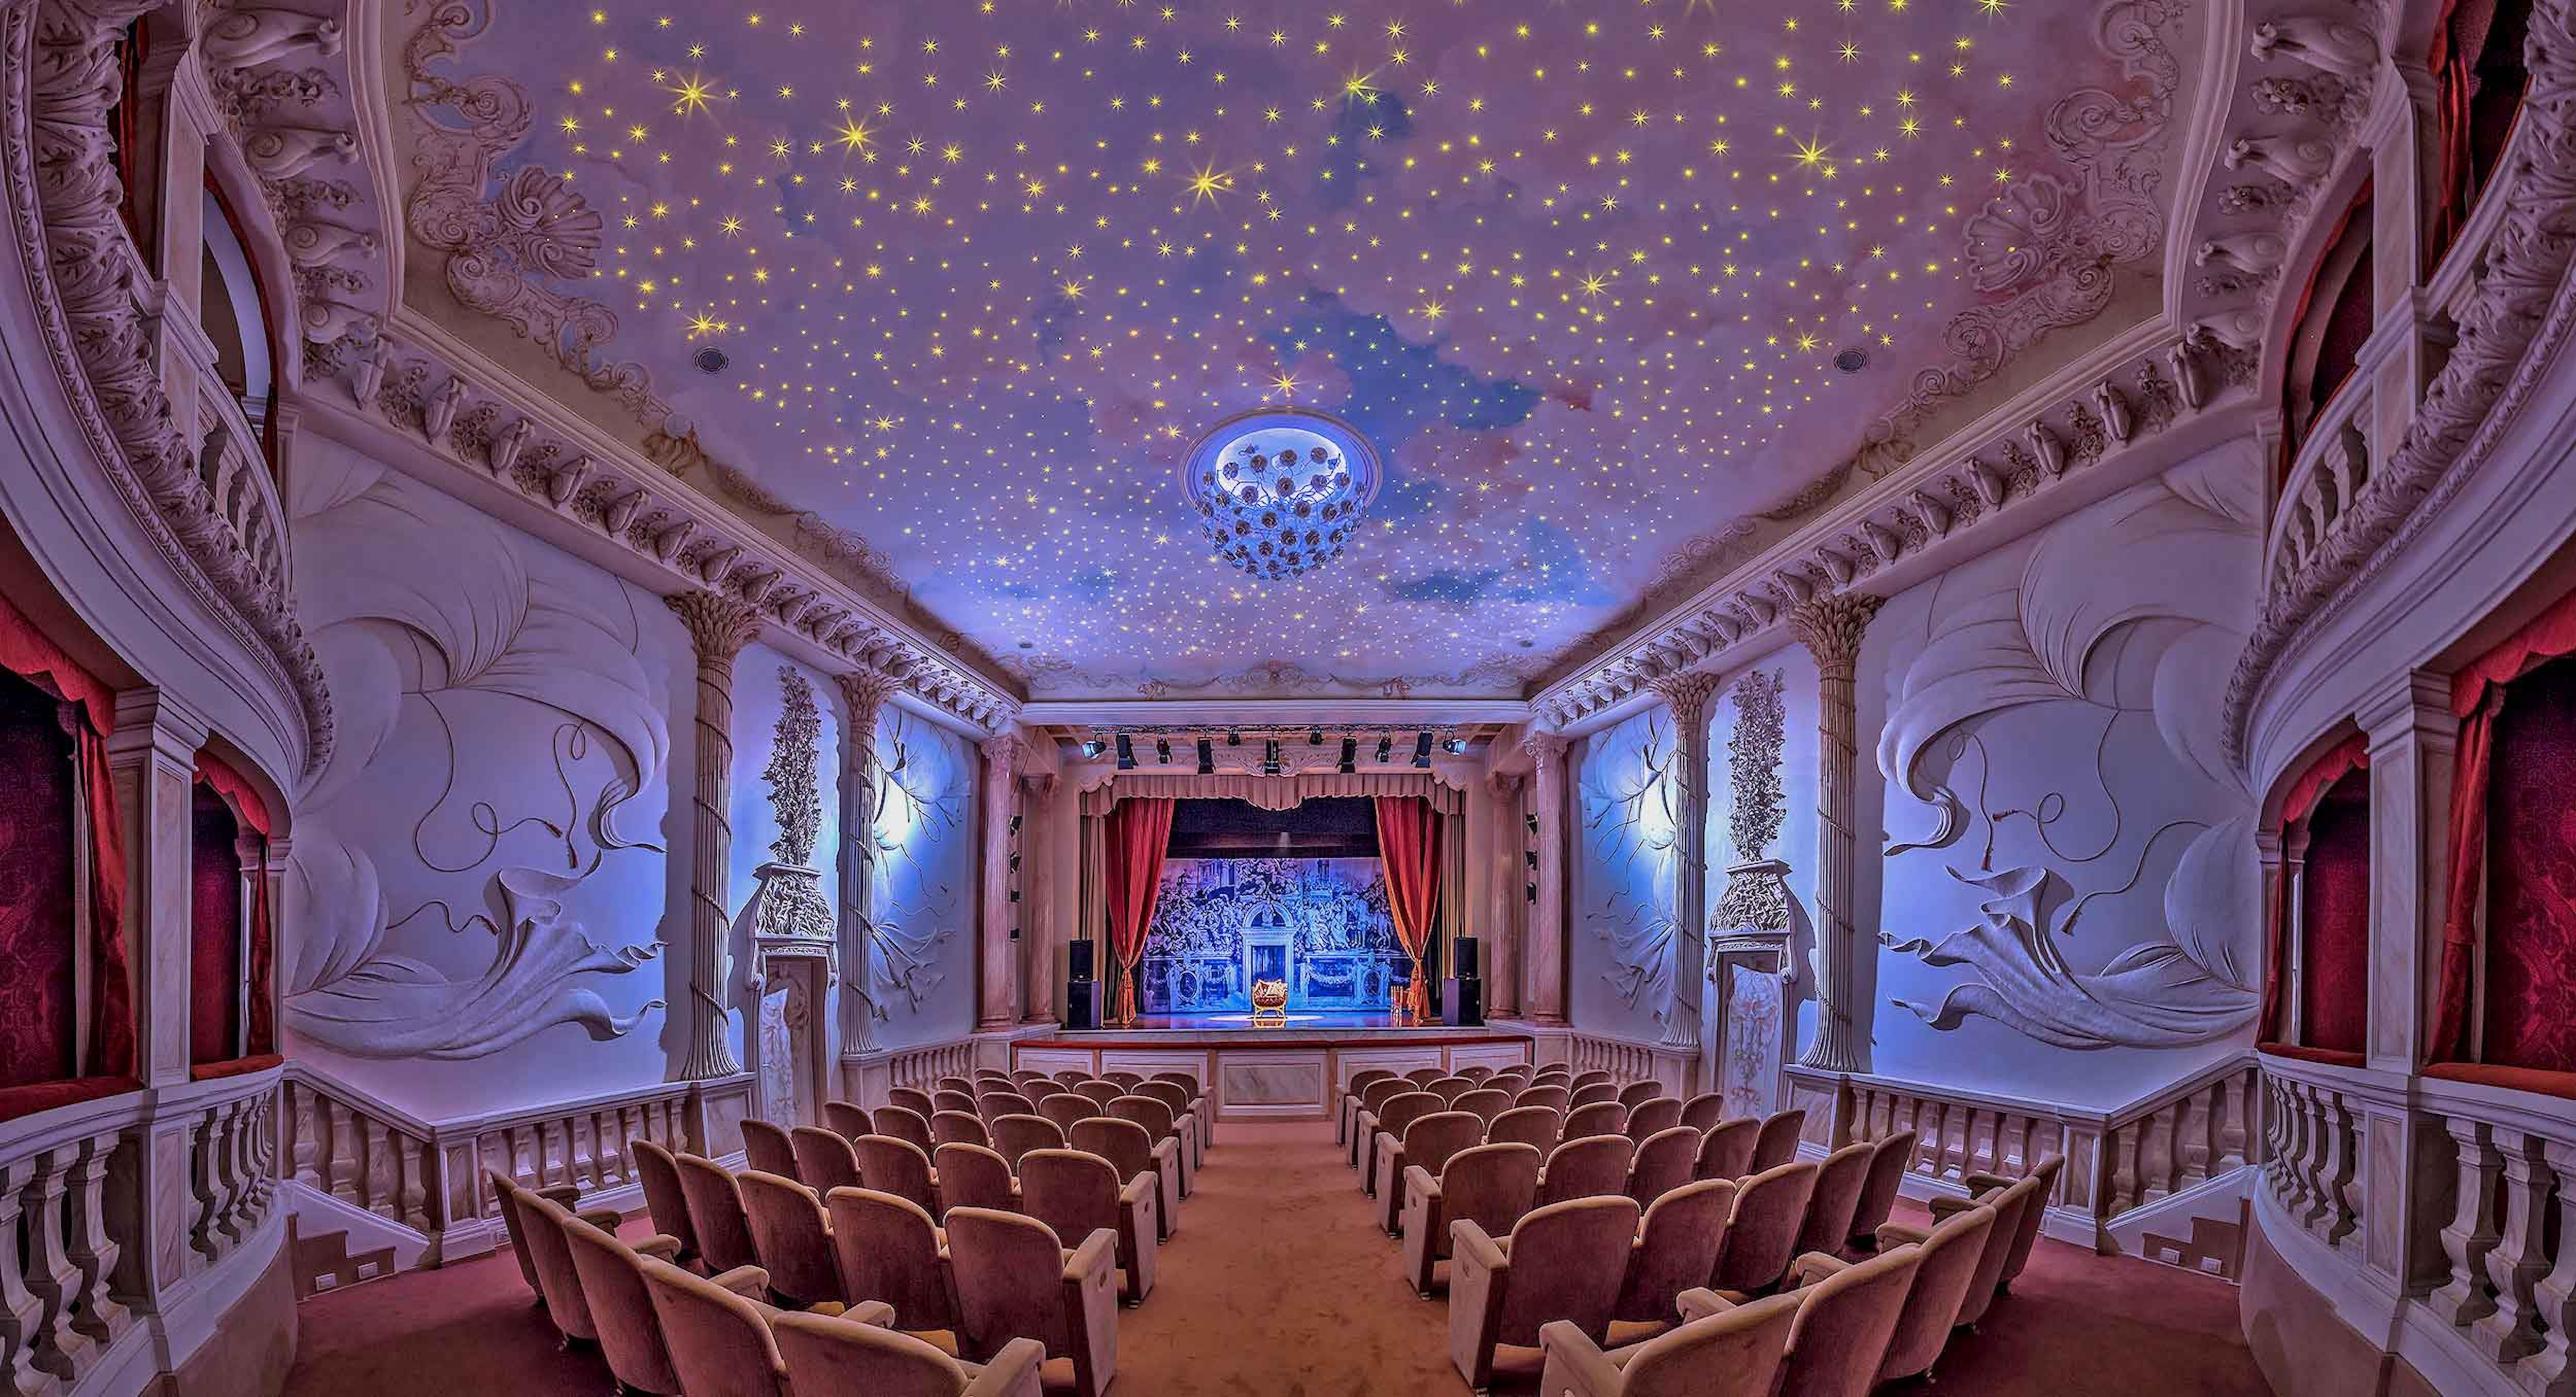 Il Teatro Antonio Belloni